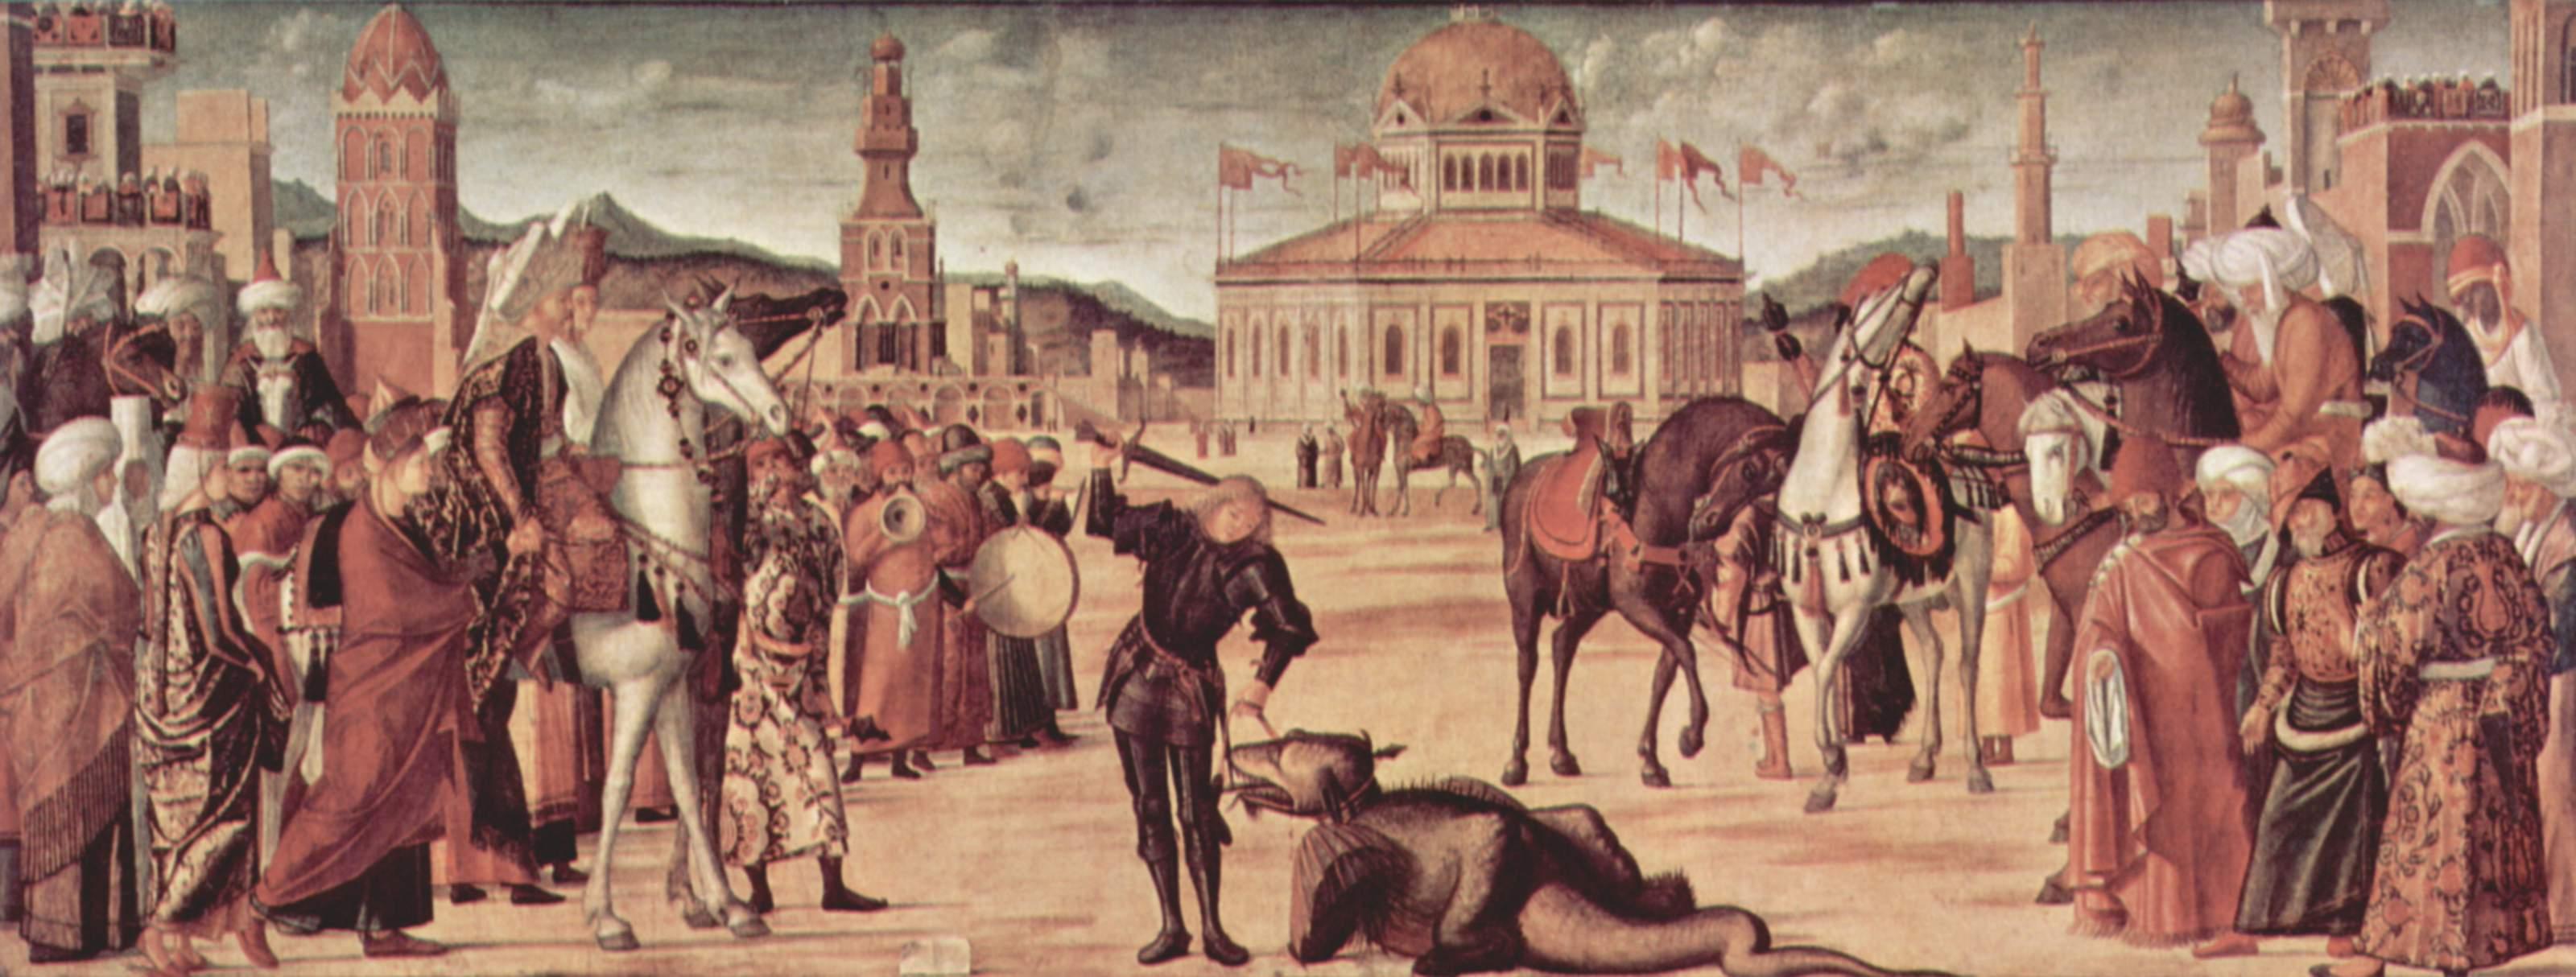 Цикл картин капеллы Скуола ди Сан Джорджио Скьявони, триумф св. Георгия, Витторе Карпаччо